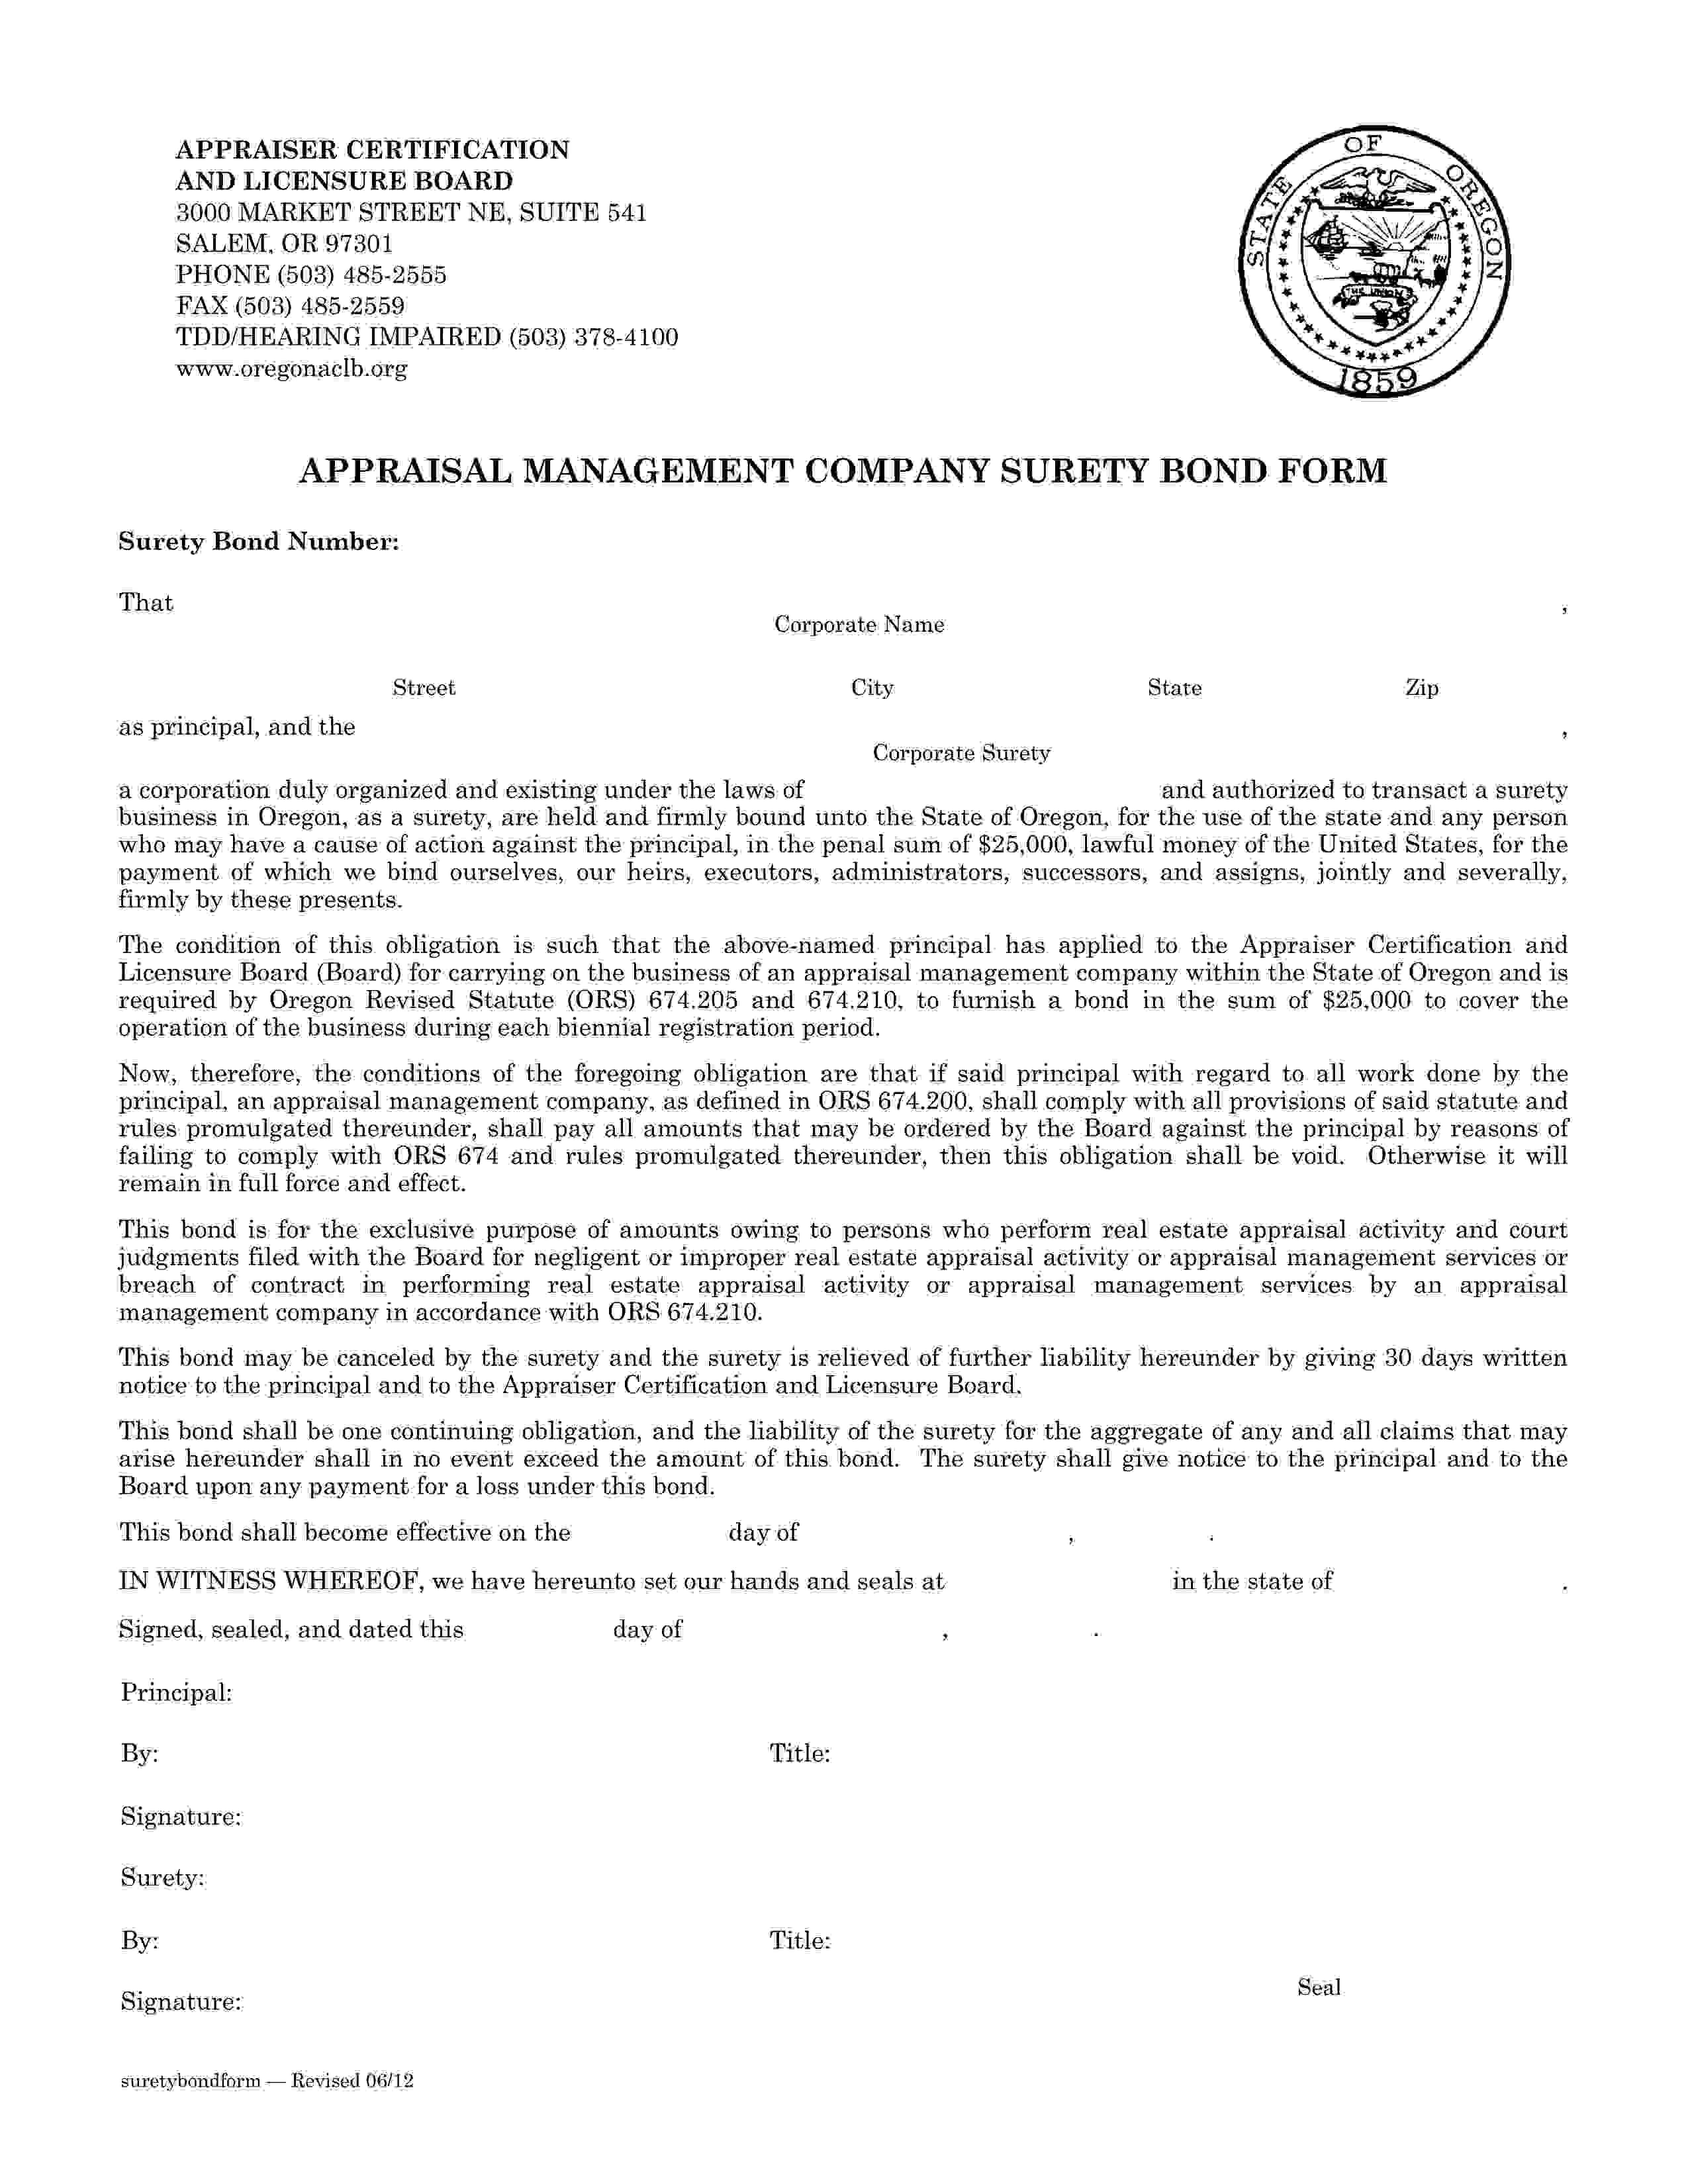 State of Oregon Appraisal Management Company sample image